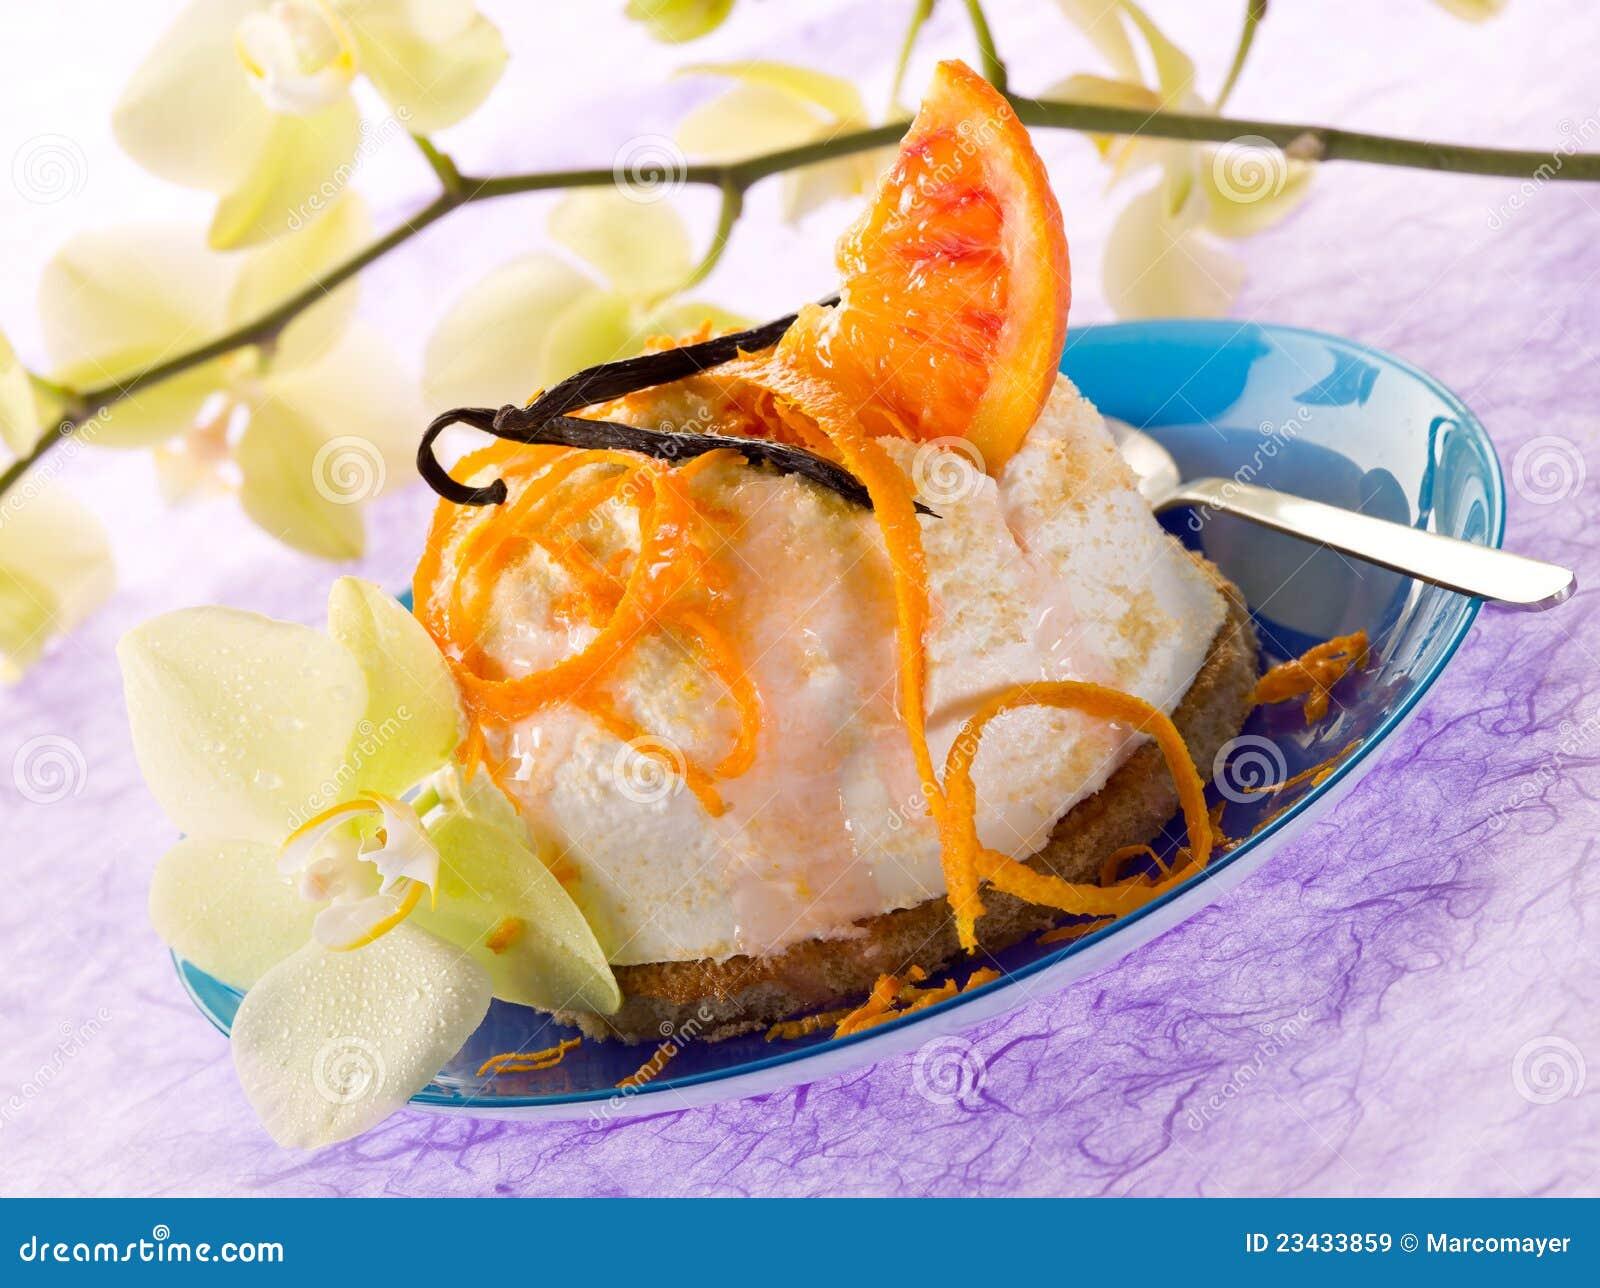 Dessert Ricotta With Orange Royalty Free Stock Images - Image ...